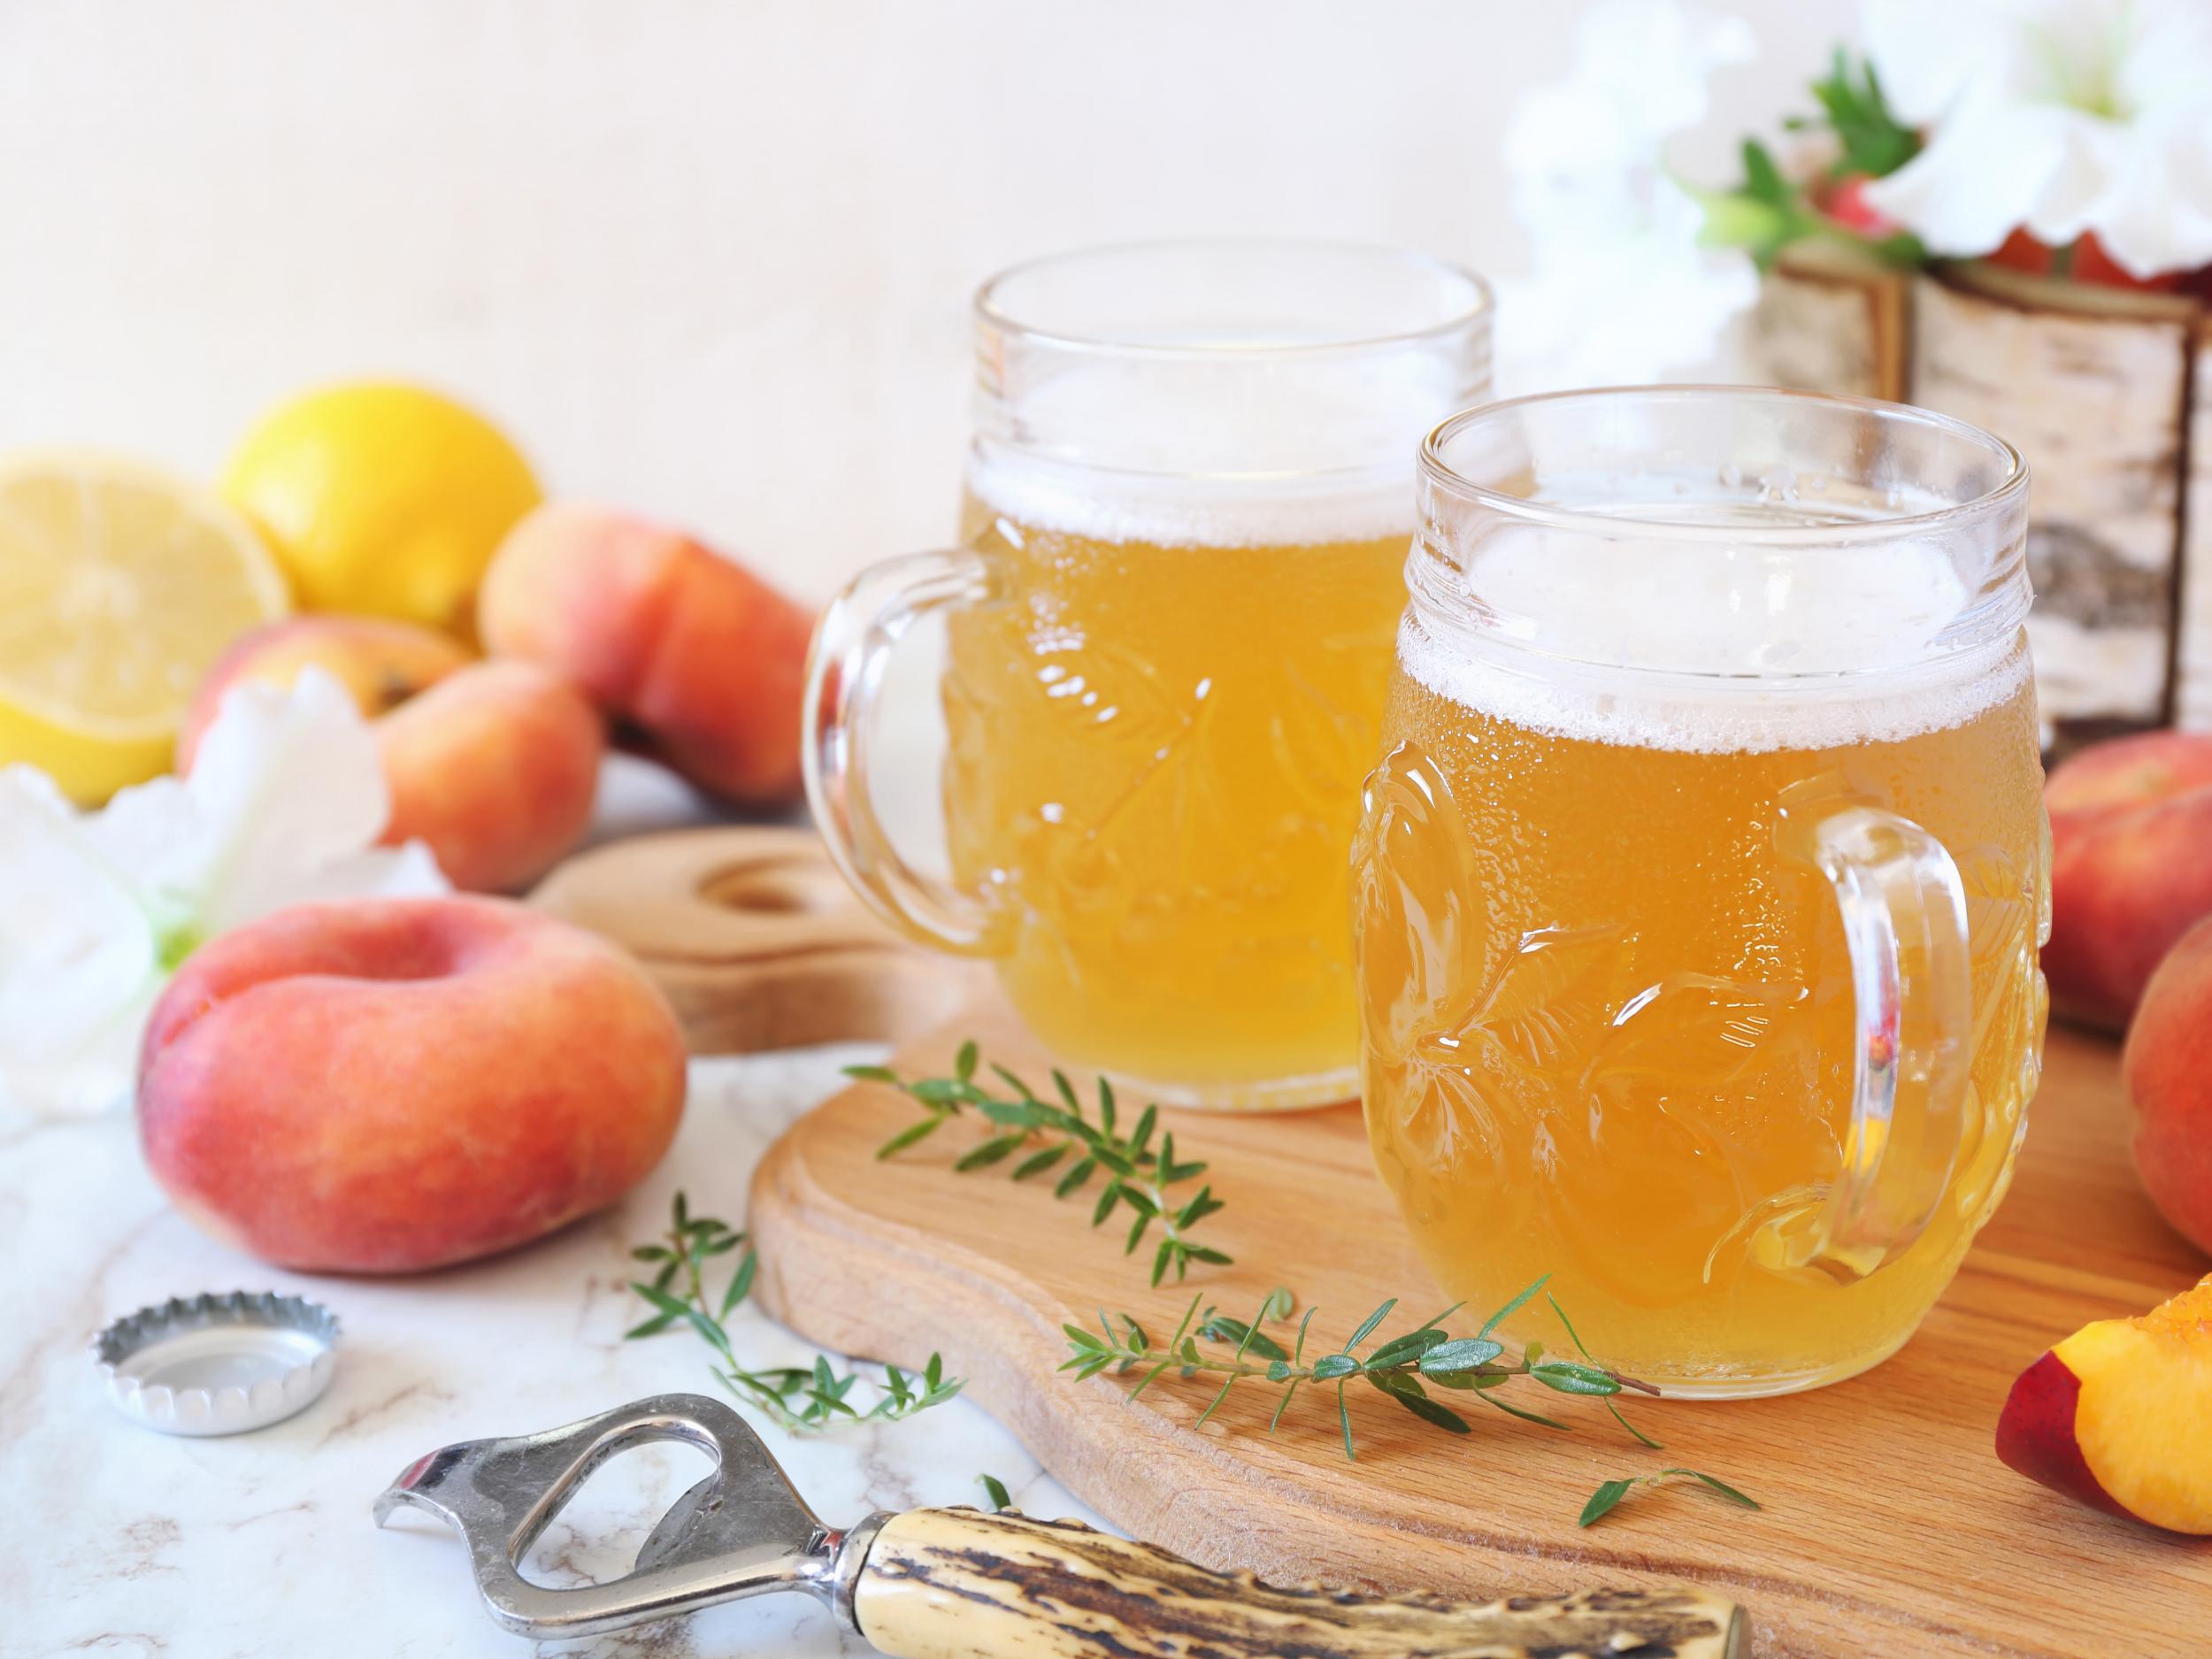 10 Best Fruit Beers The Independent Ps4 Birthdays Beginning Reg 2